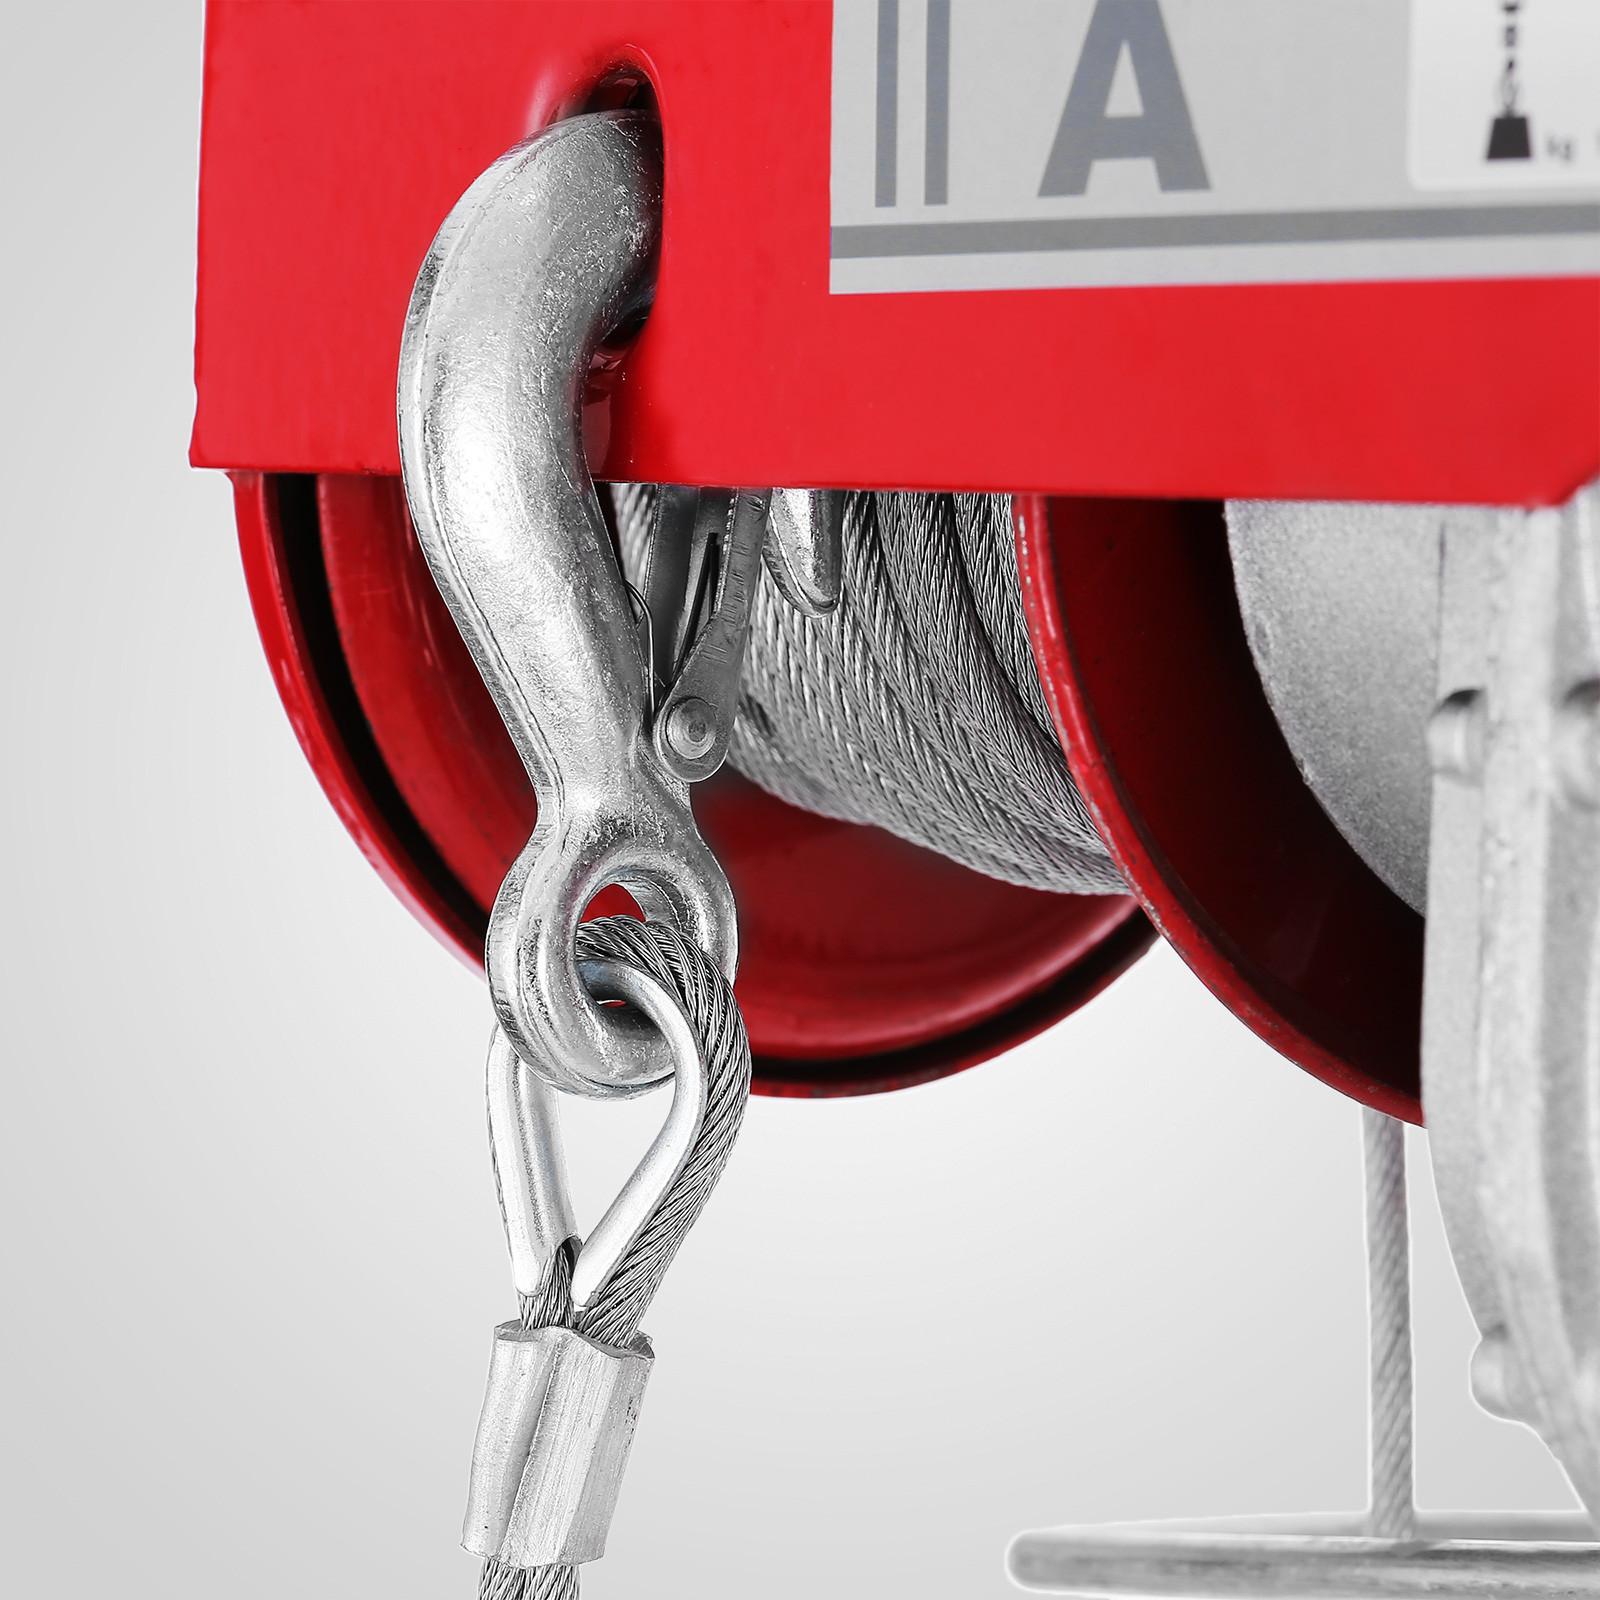 100kg-900kg-Electric-Hoist-Winch-Lifting-Engine-Crane-Cable-Lift-Hook-Garage miniature 45